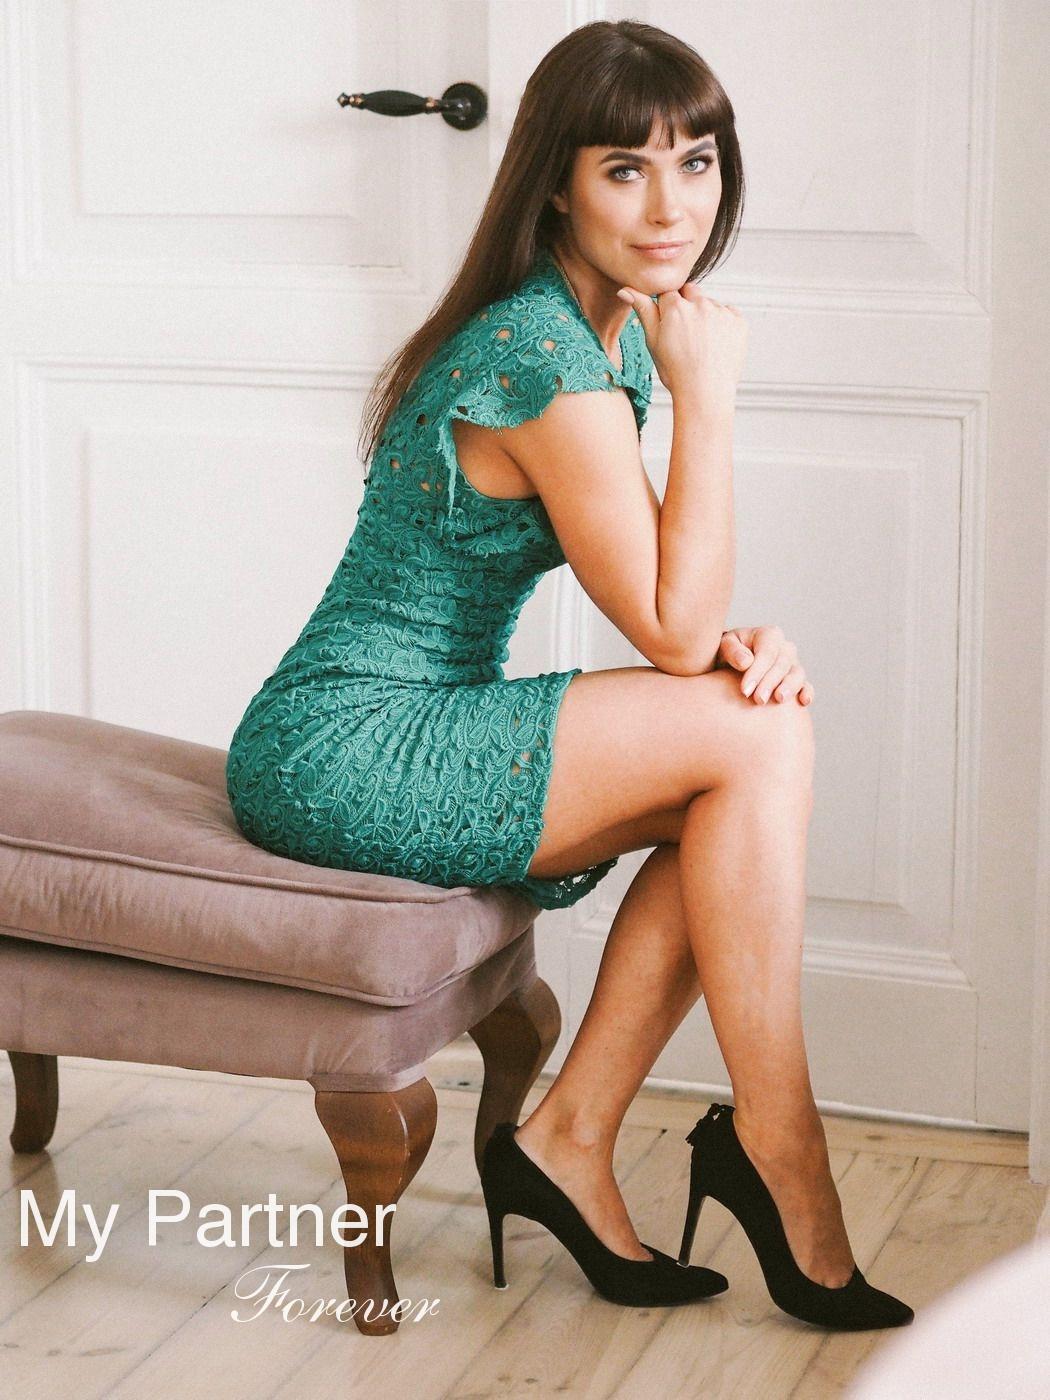 International Matchmaking Service to Meet Nadezhda from Grodno, Belarus